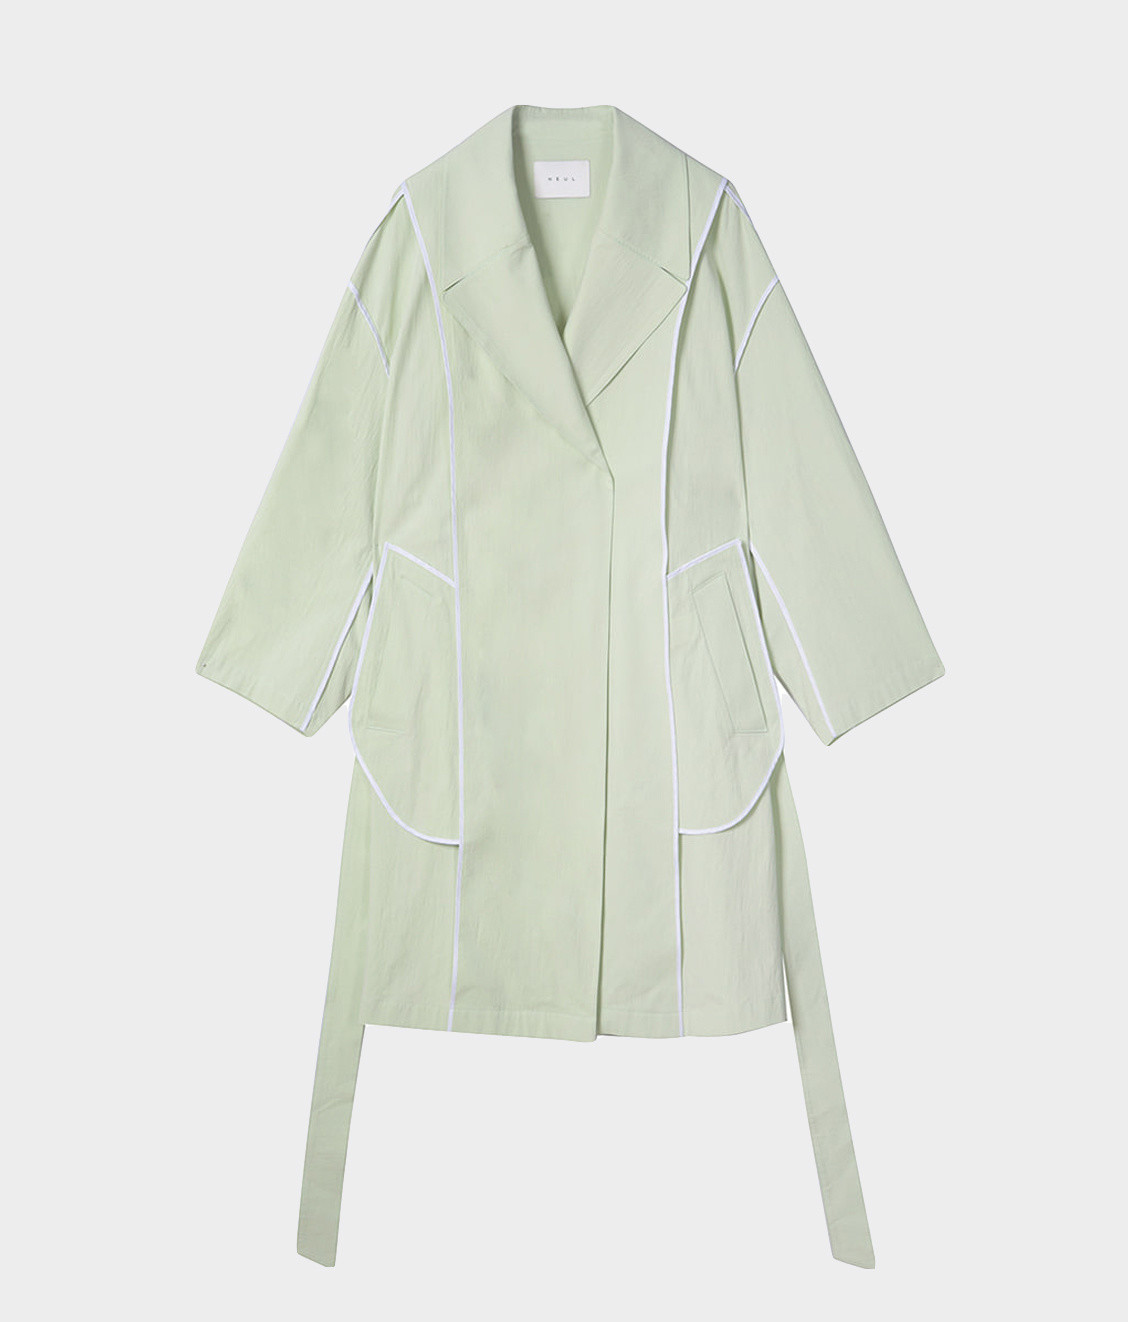 NEUL Neul Reverse Trench Coat Lime Cream